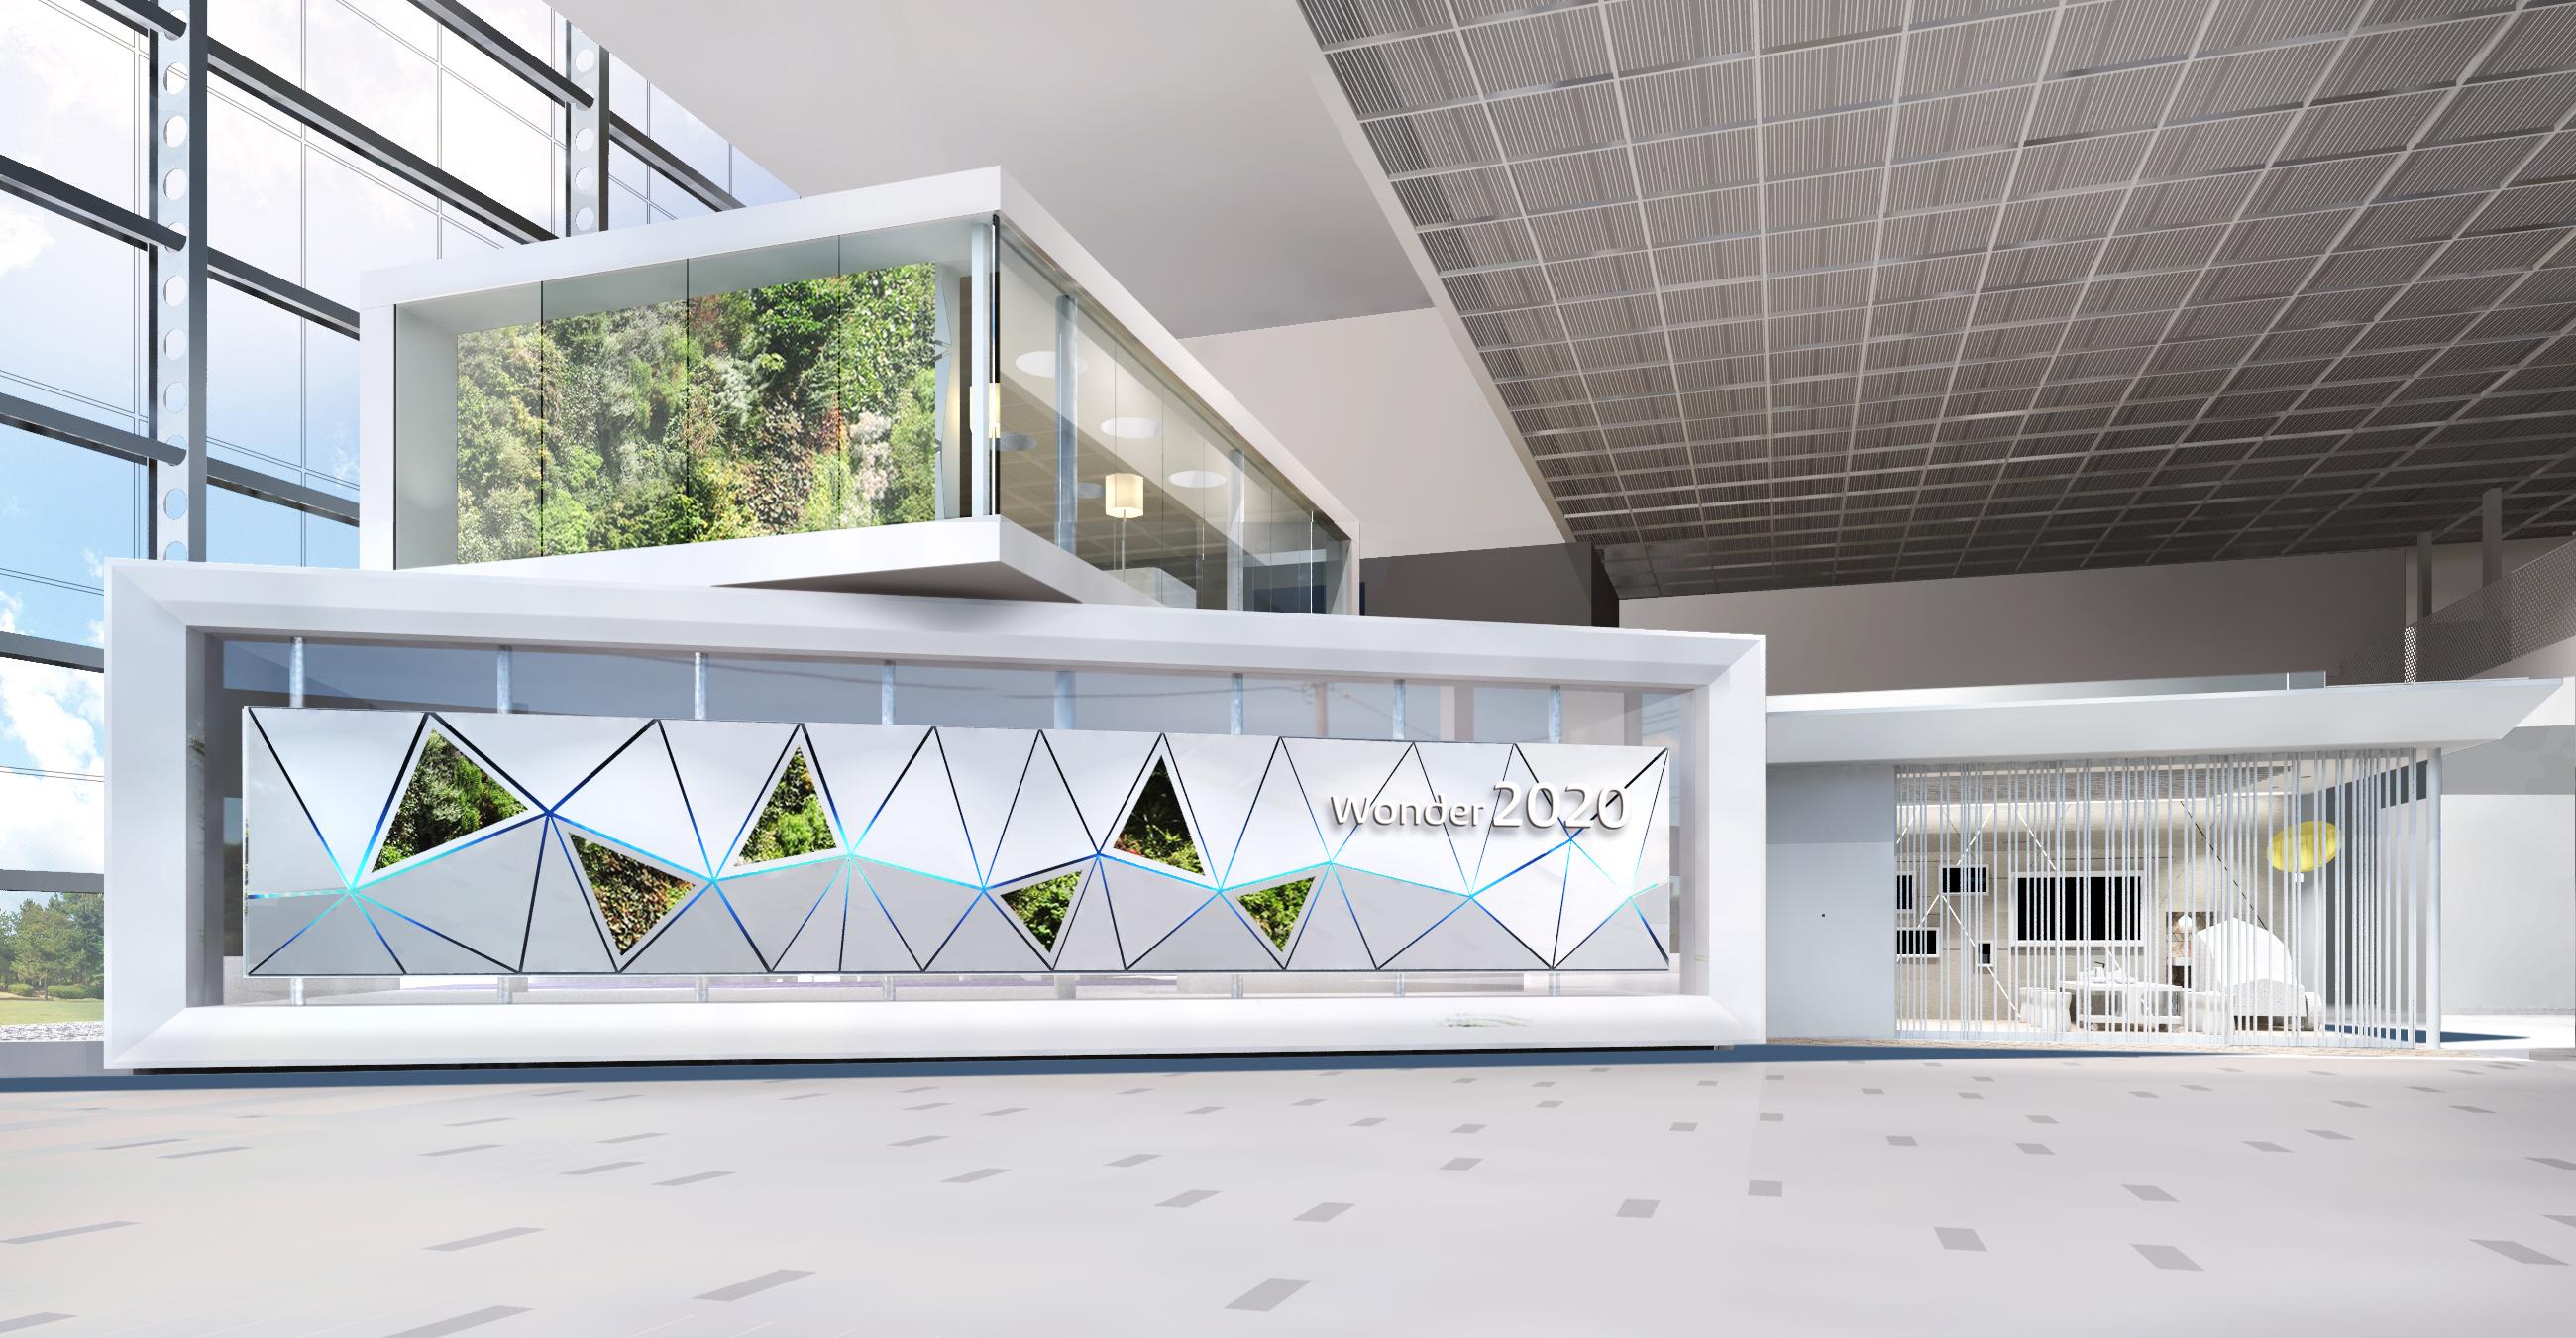 「Wonder Life-BOX 2020」パナソニックセンター東京に新設